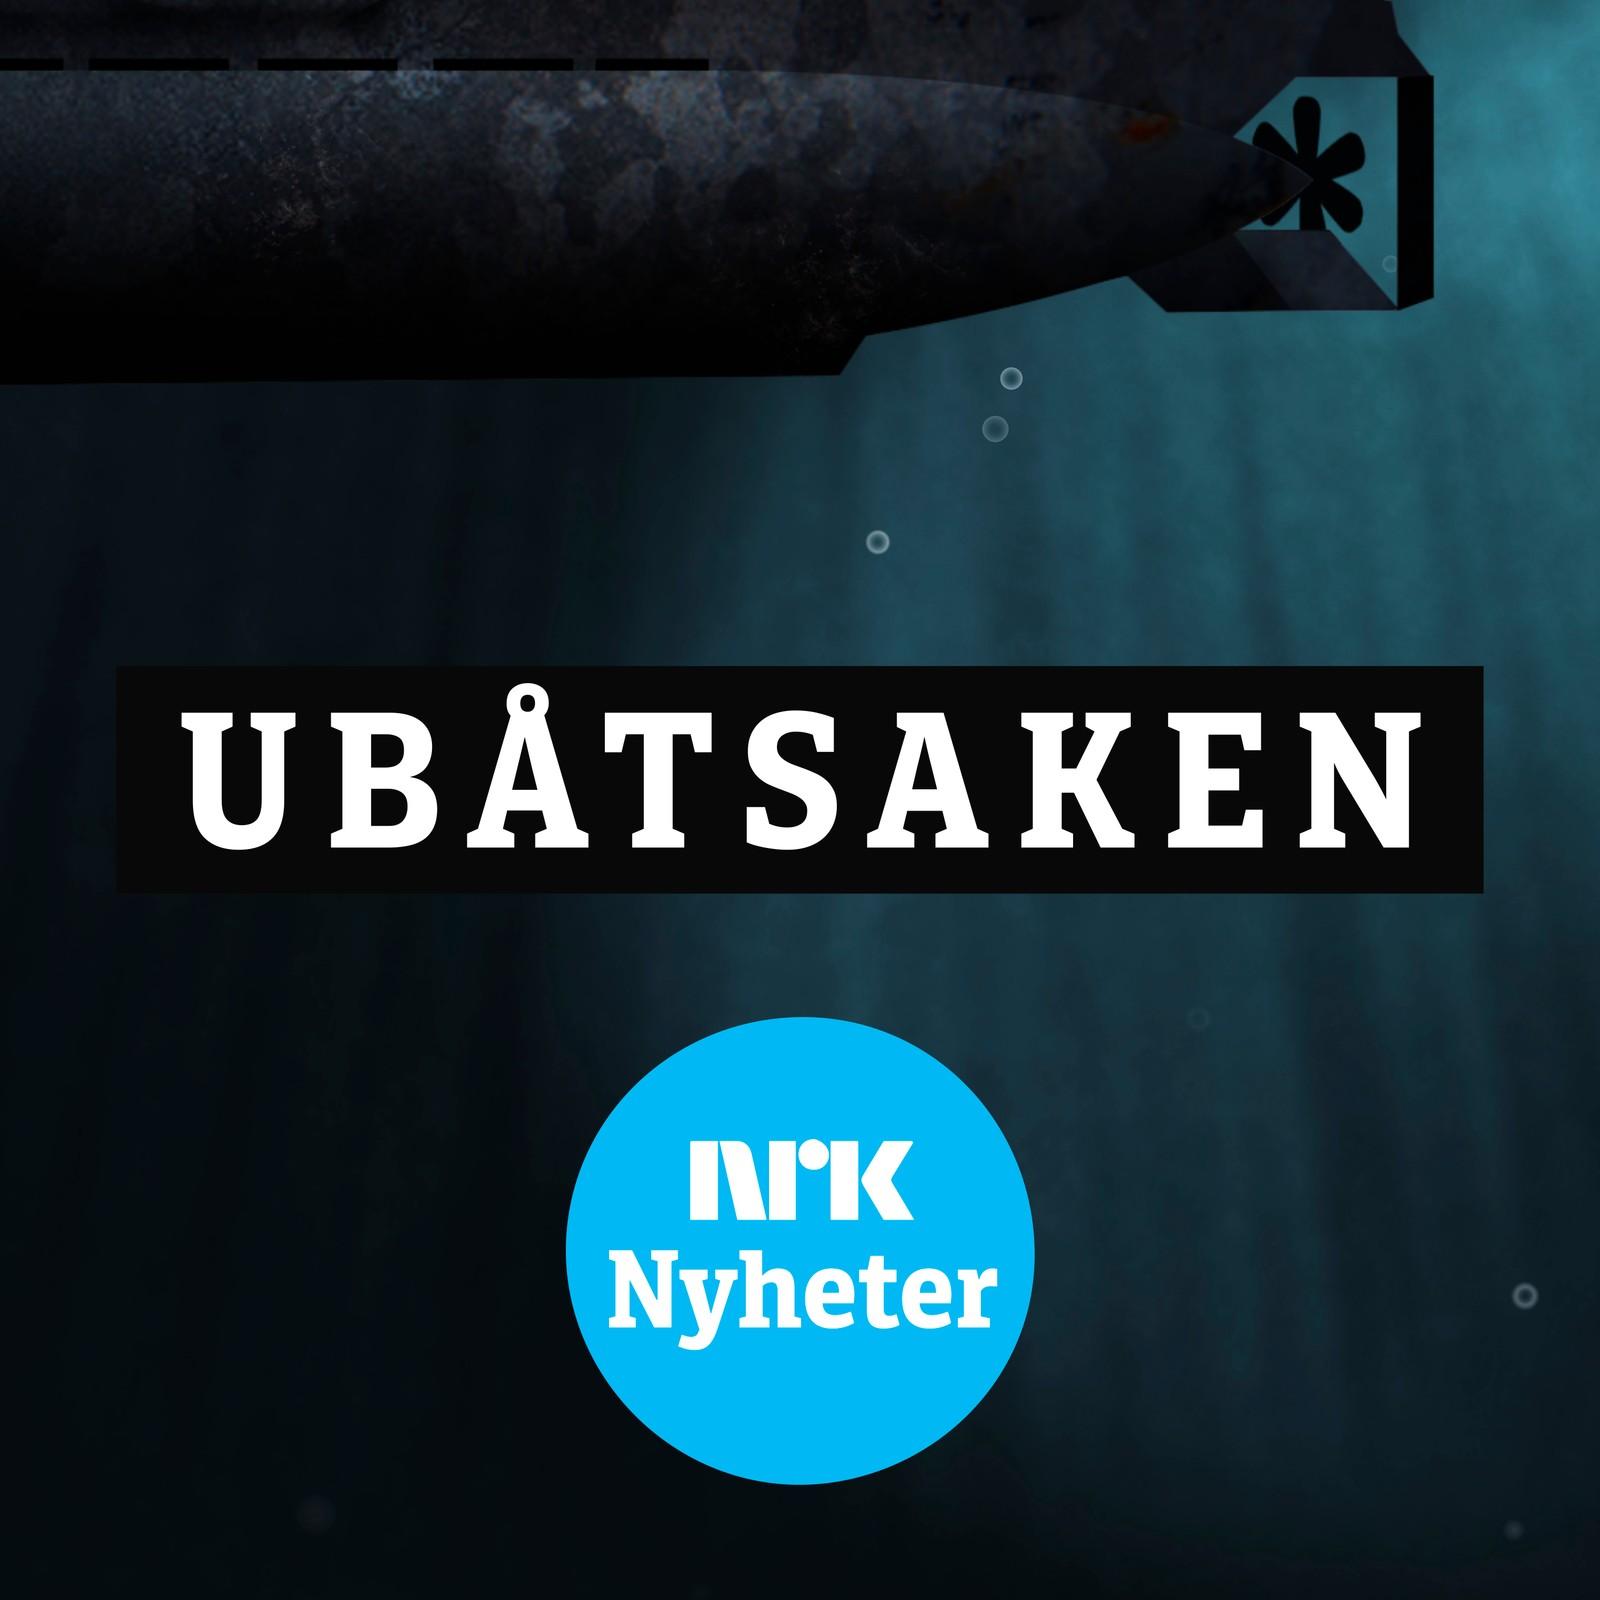 Ubåtsaken